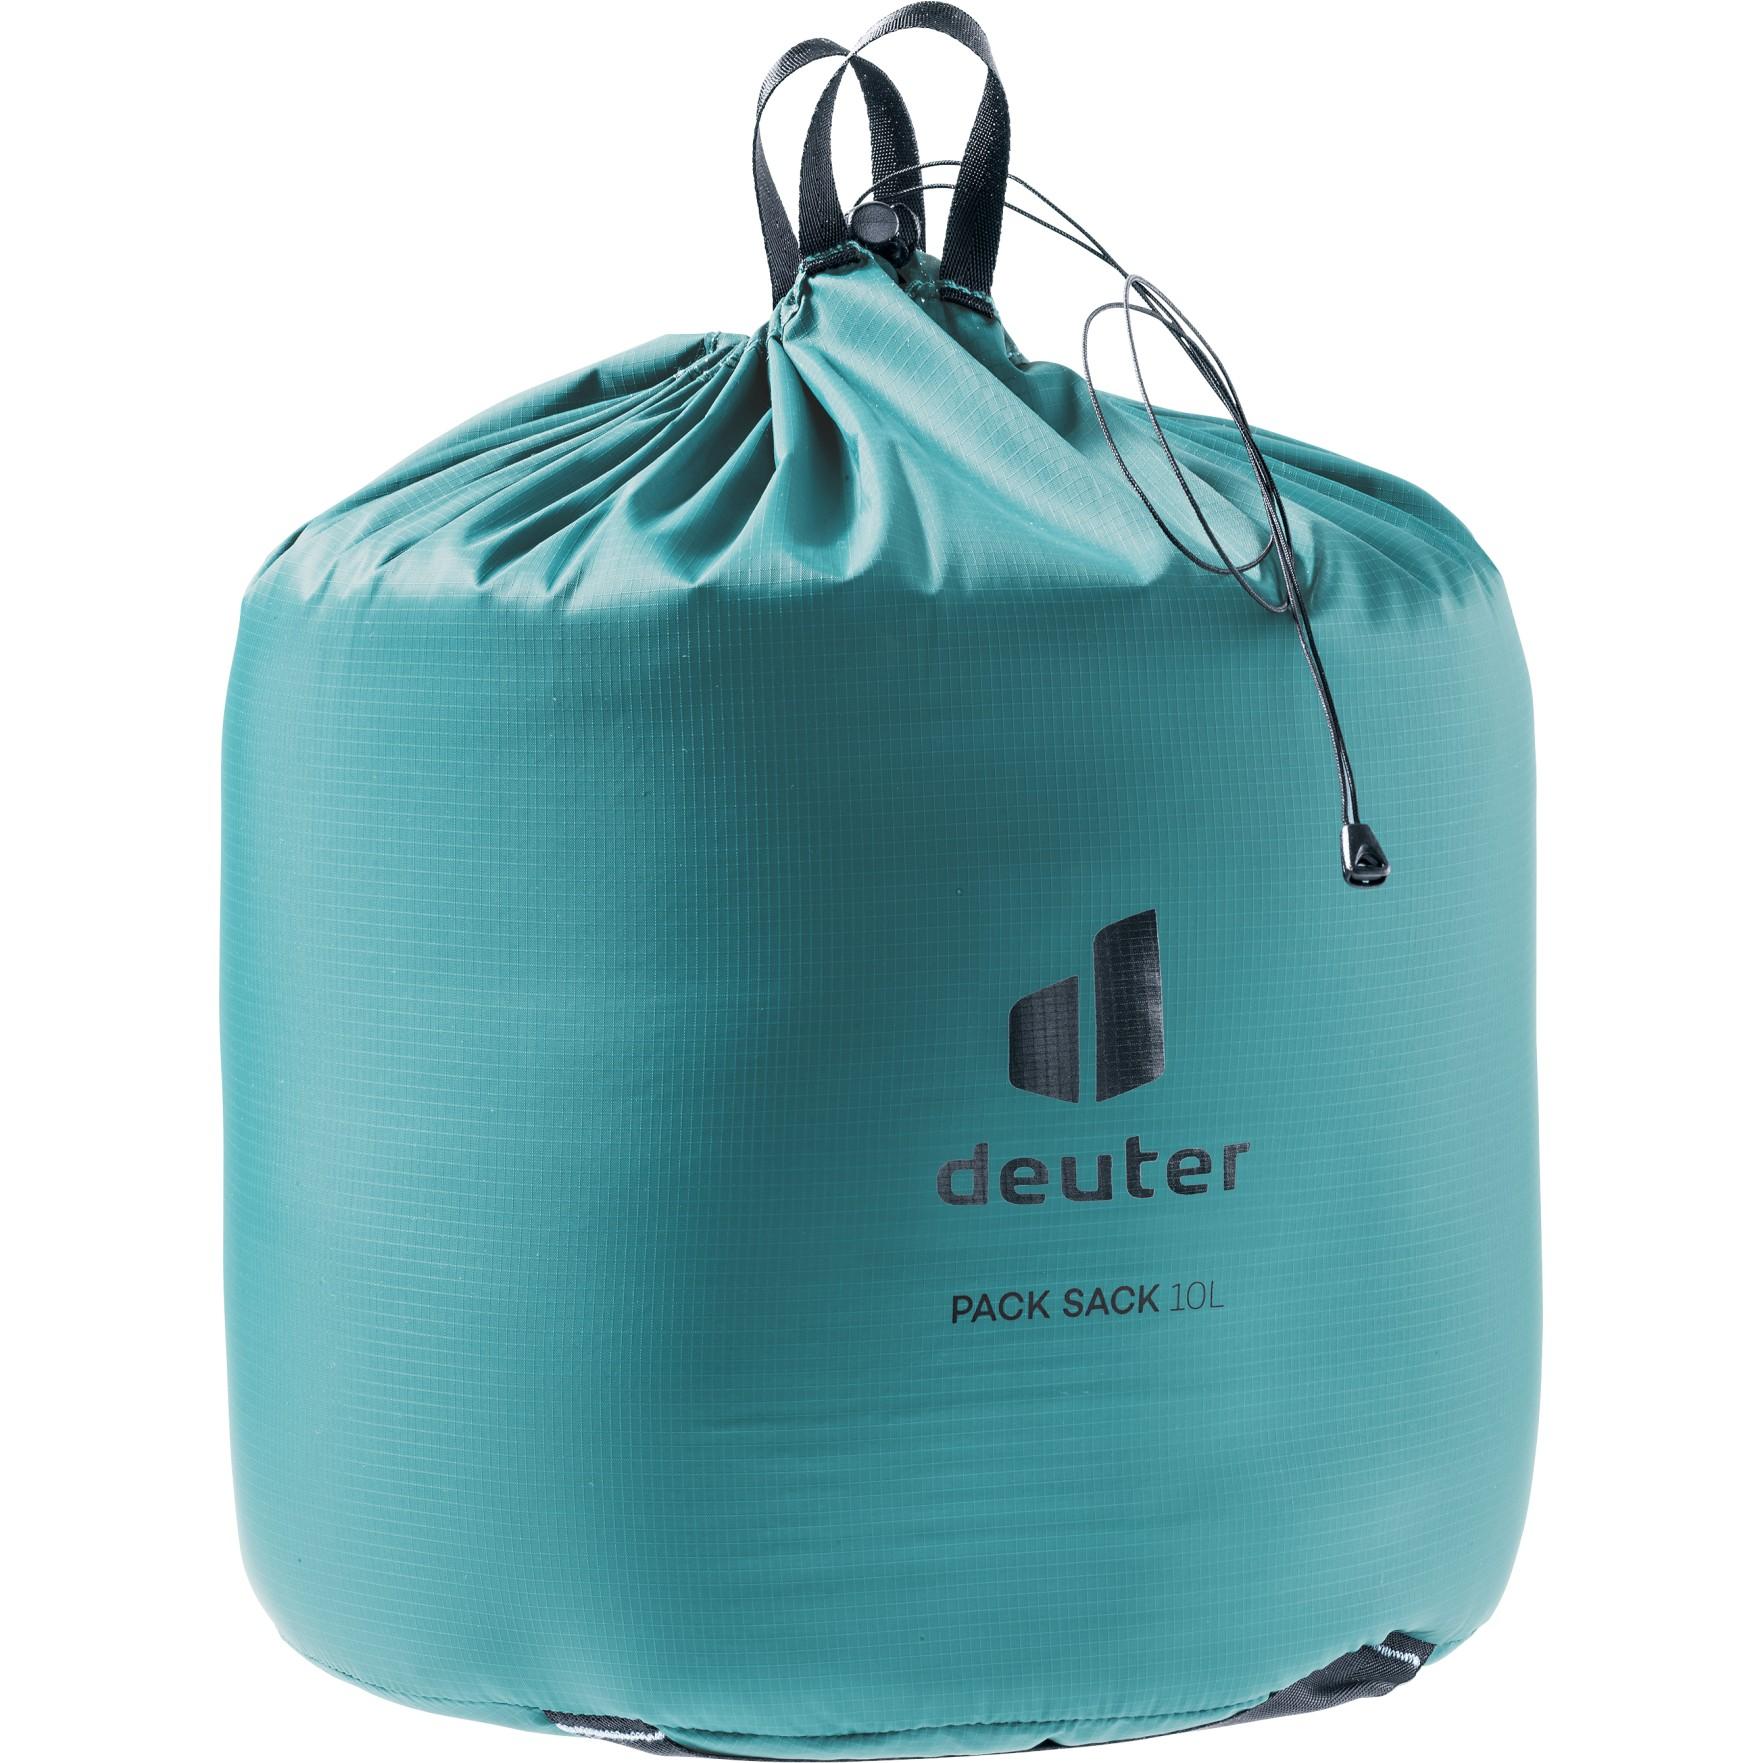 Picture of Deuter Pack Sack 10 liters - petrol